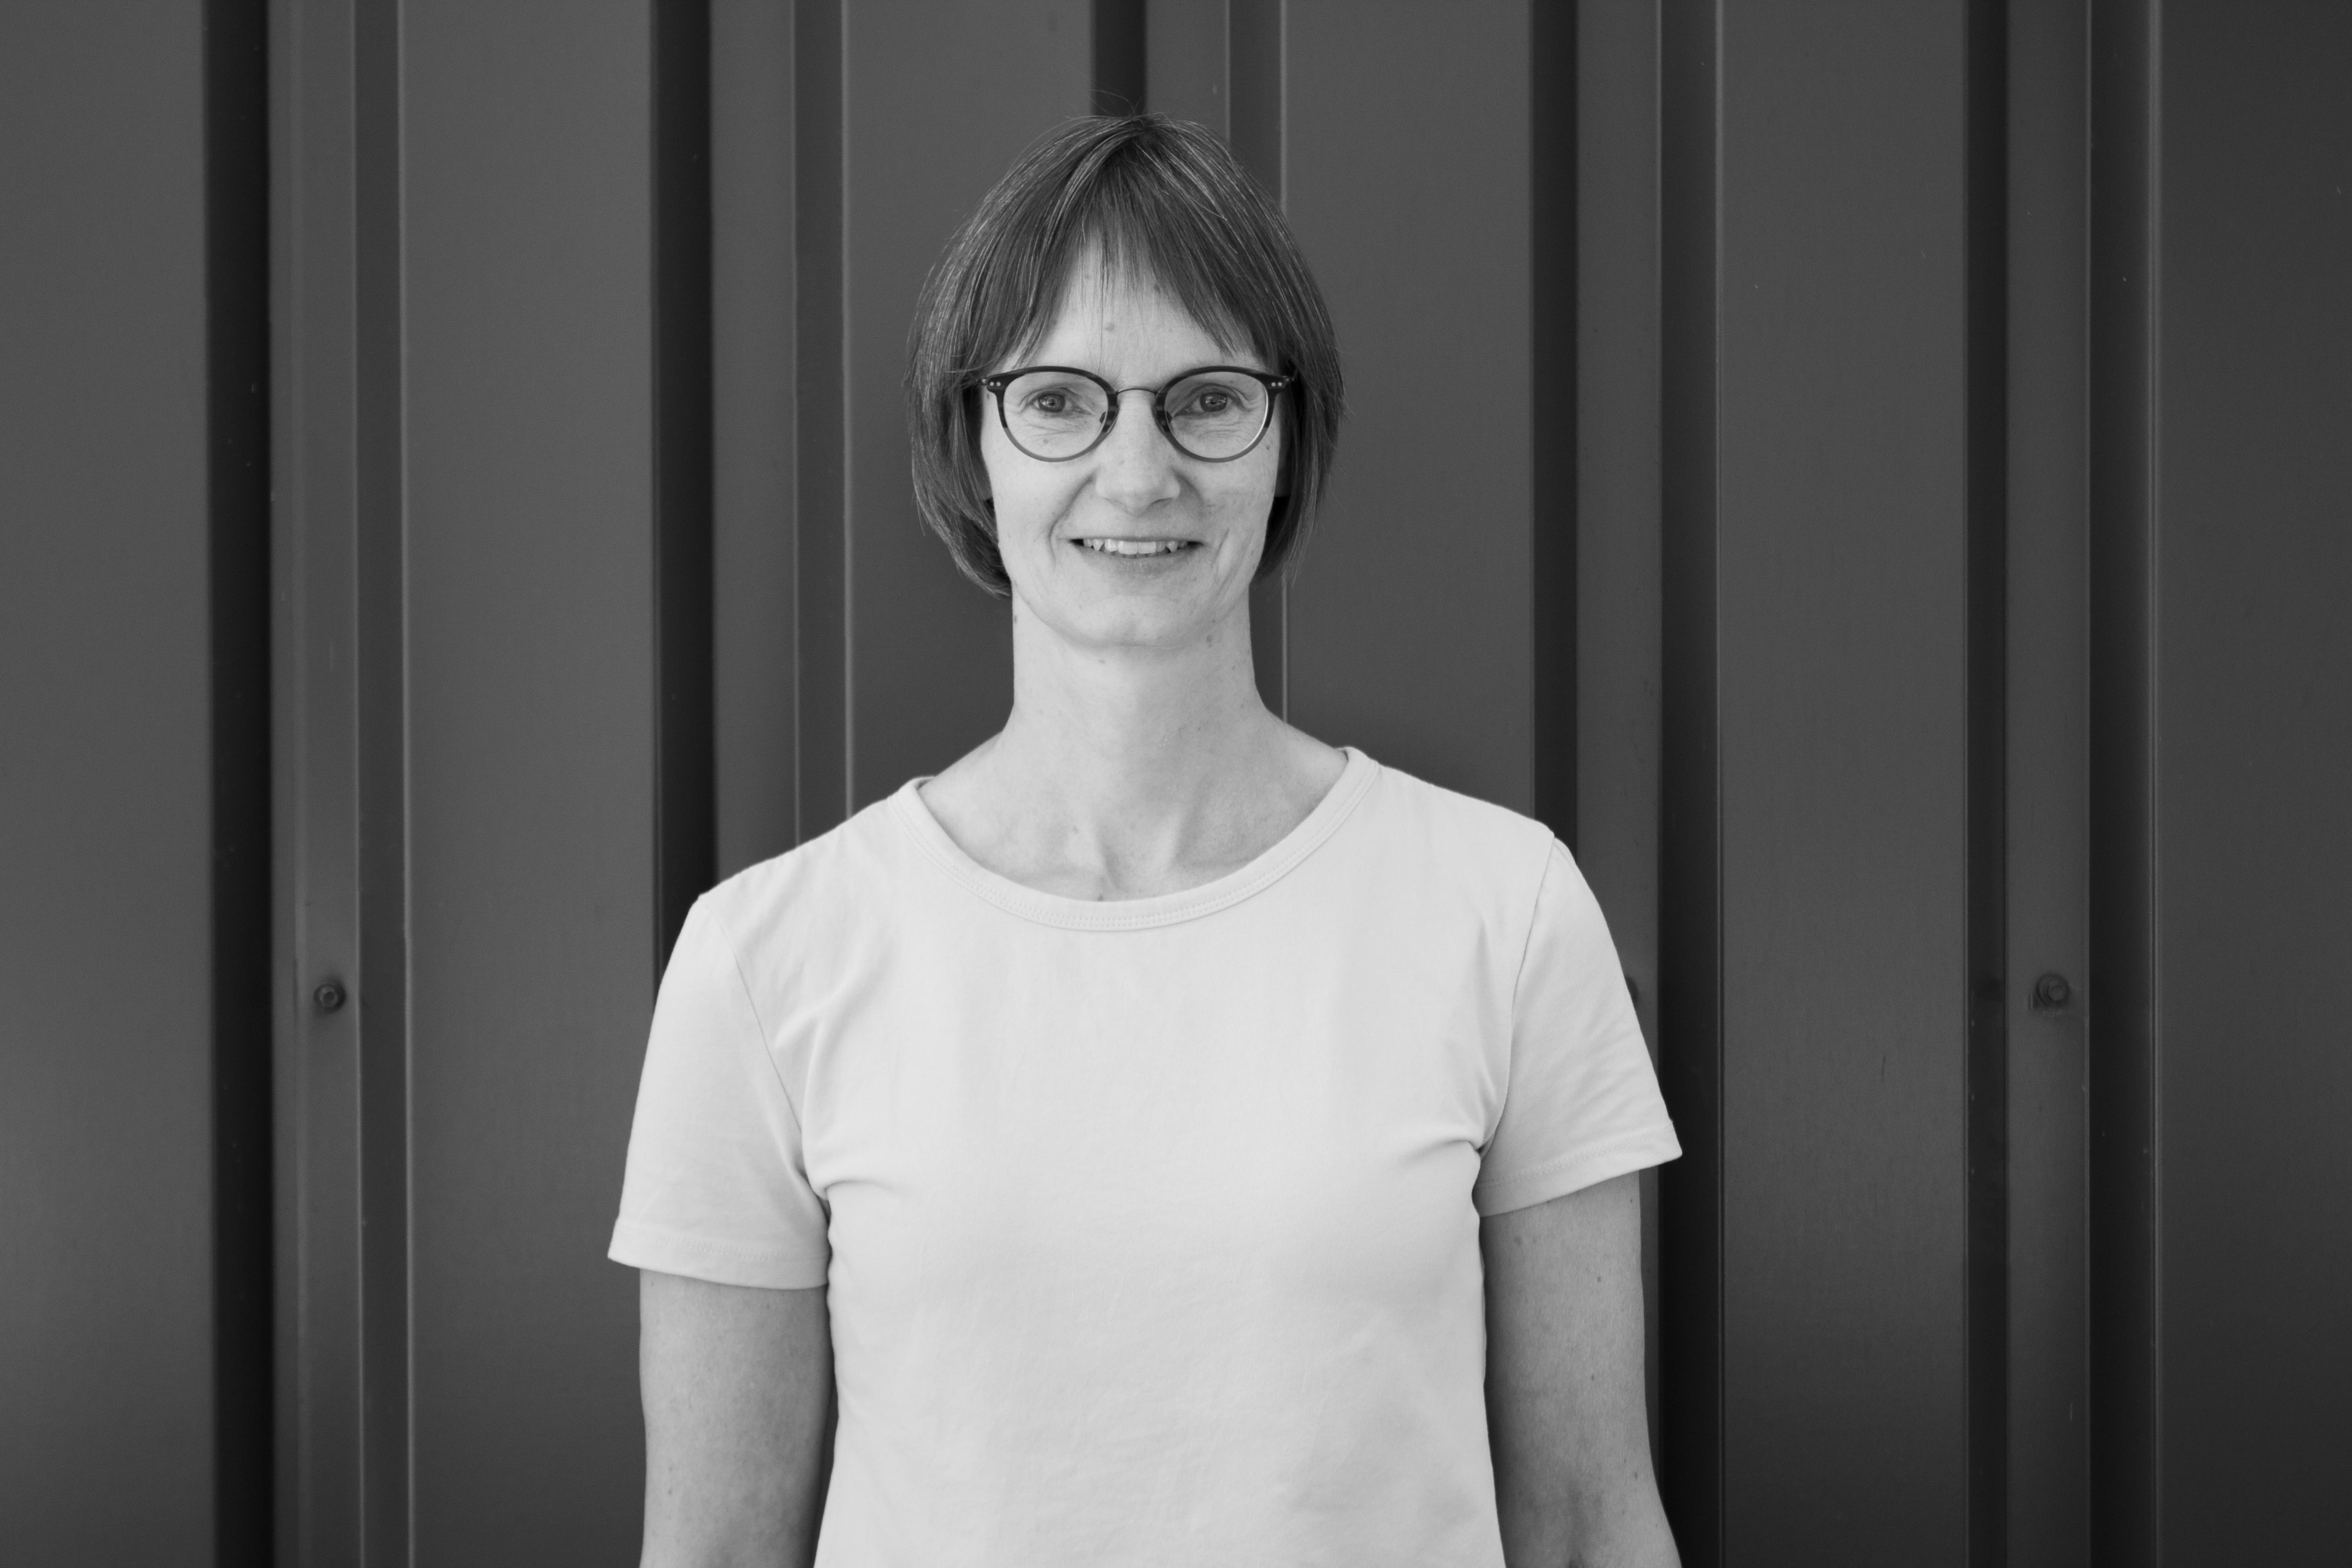 Marianne Kappelhøj